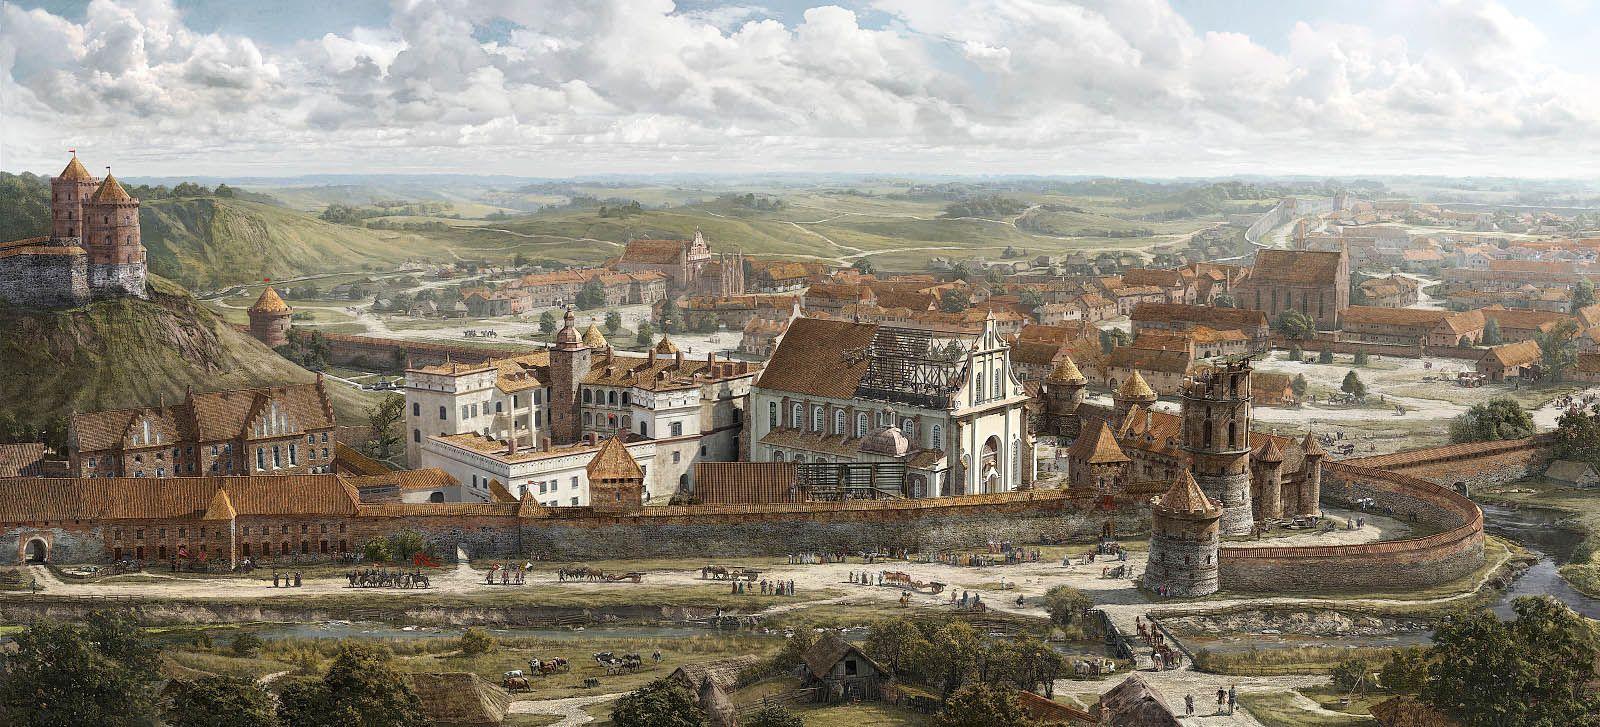 Image result for medieval city